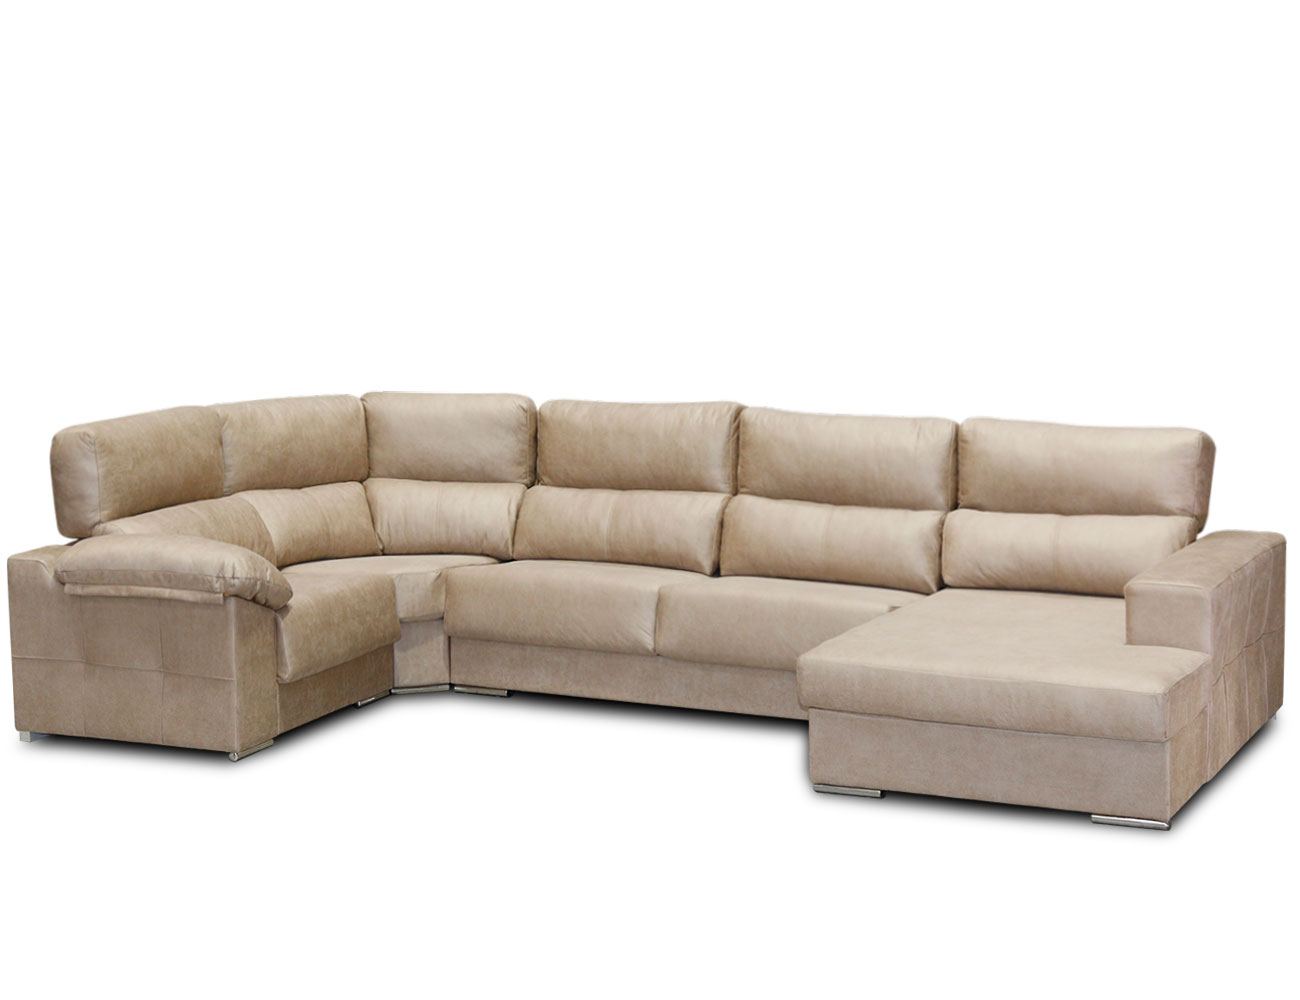 Sof rinconera chaiselongue con forma de u en tejido anti - Tejidos para sofas ...